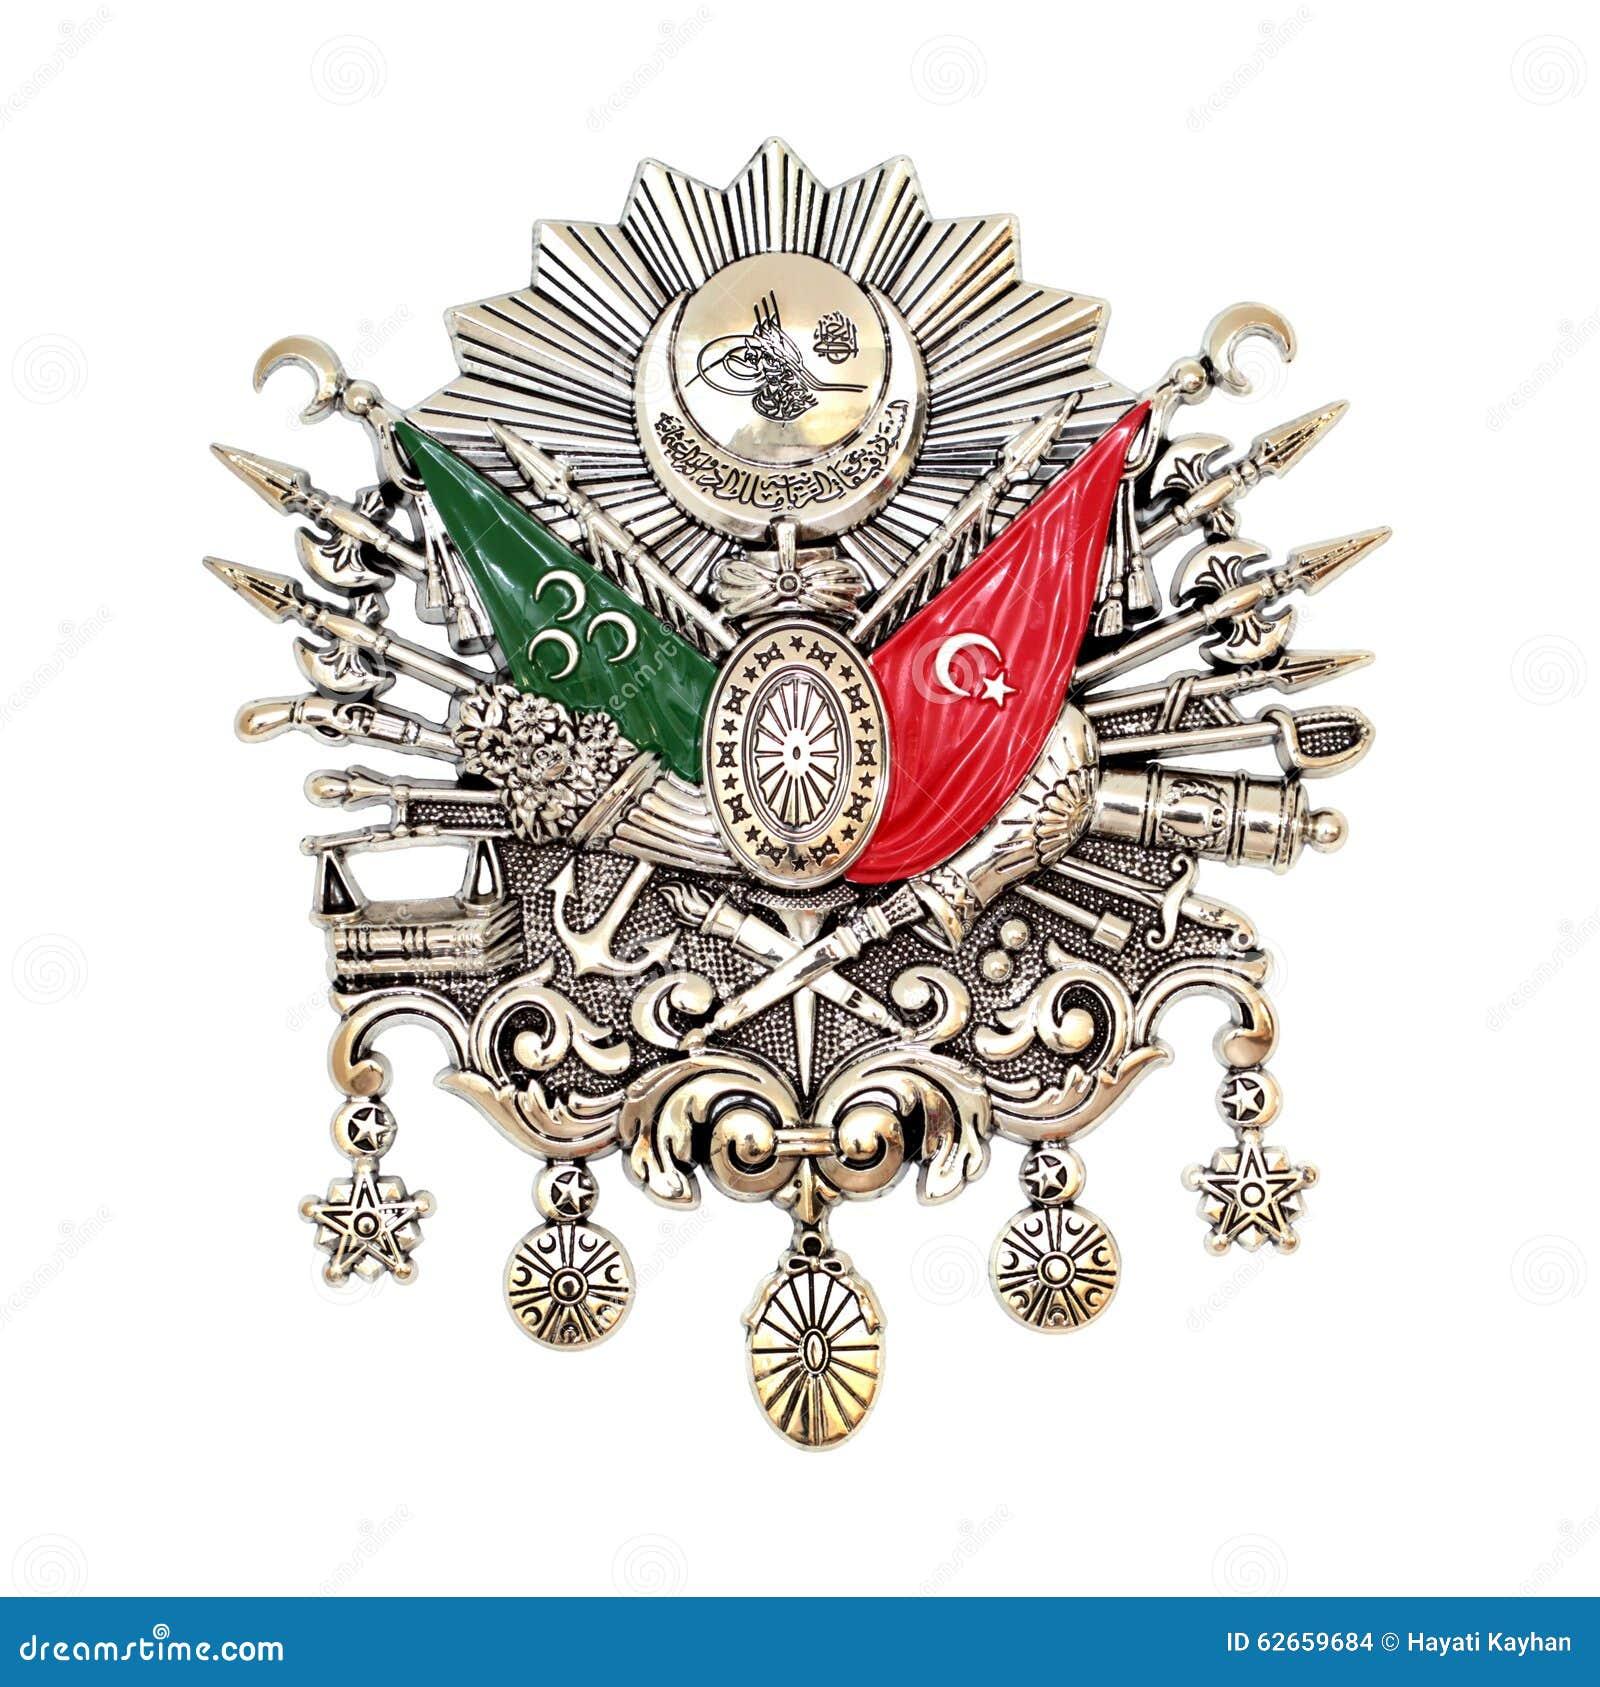 pics for gt ottoman empire tattoo